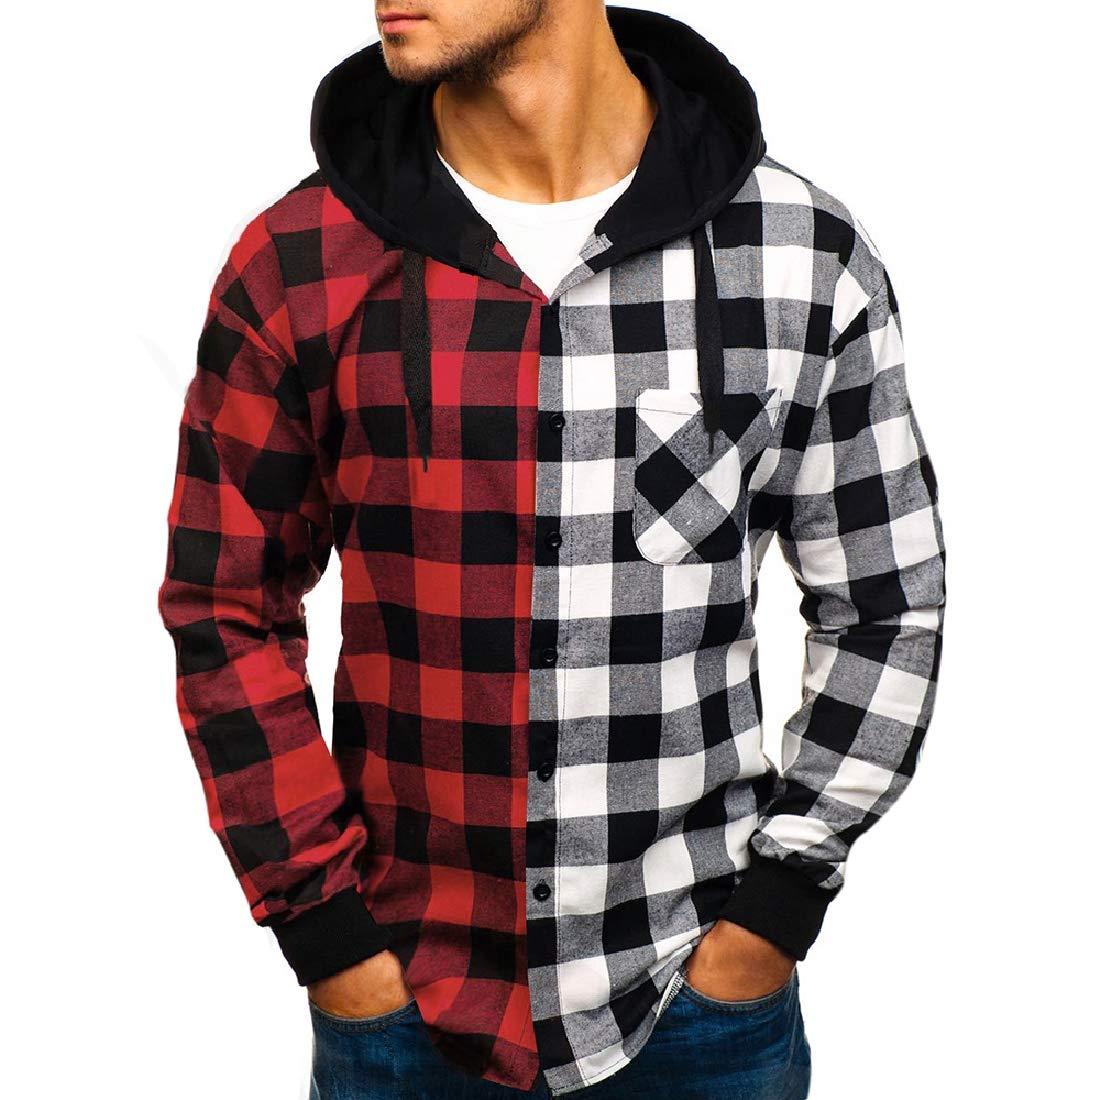 CRYYU Men Plaid Check Buttons Business Casual Drawstring Hoodie Dress Shirts